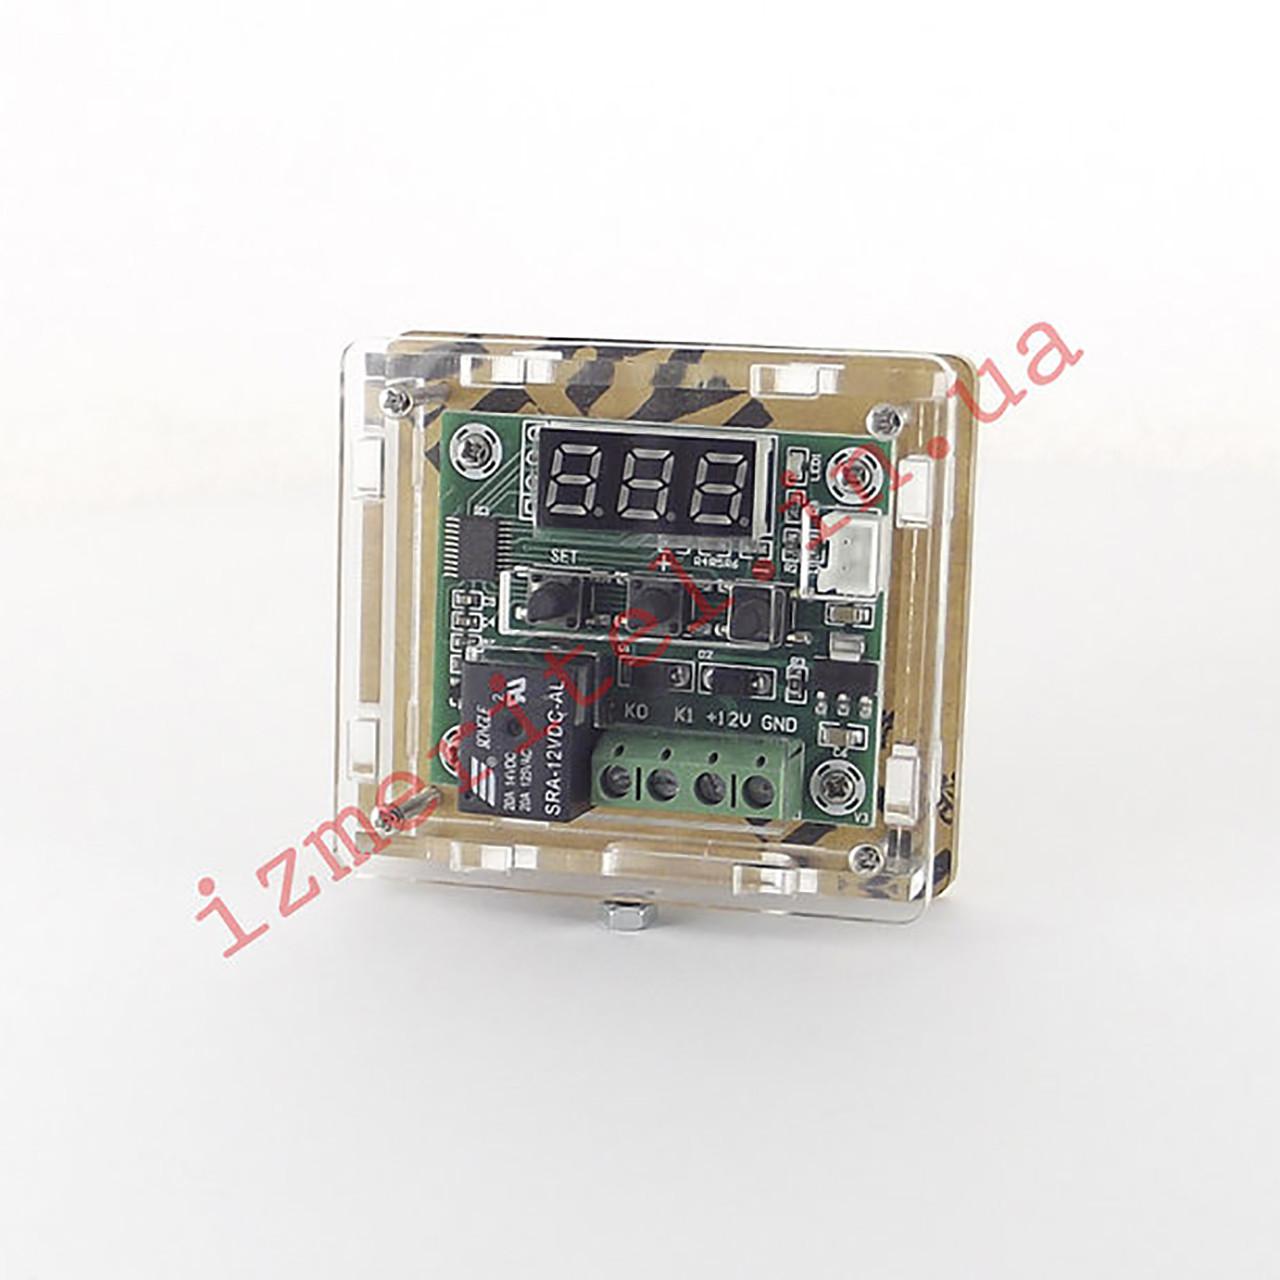 Корпус для терморегулятора и циклического реле времени W1209